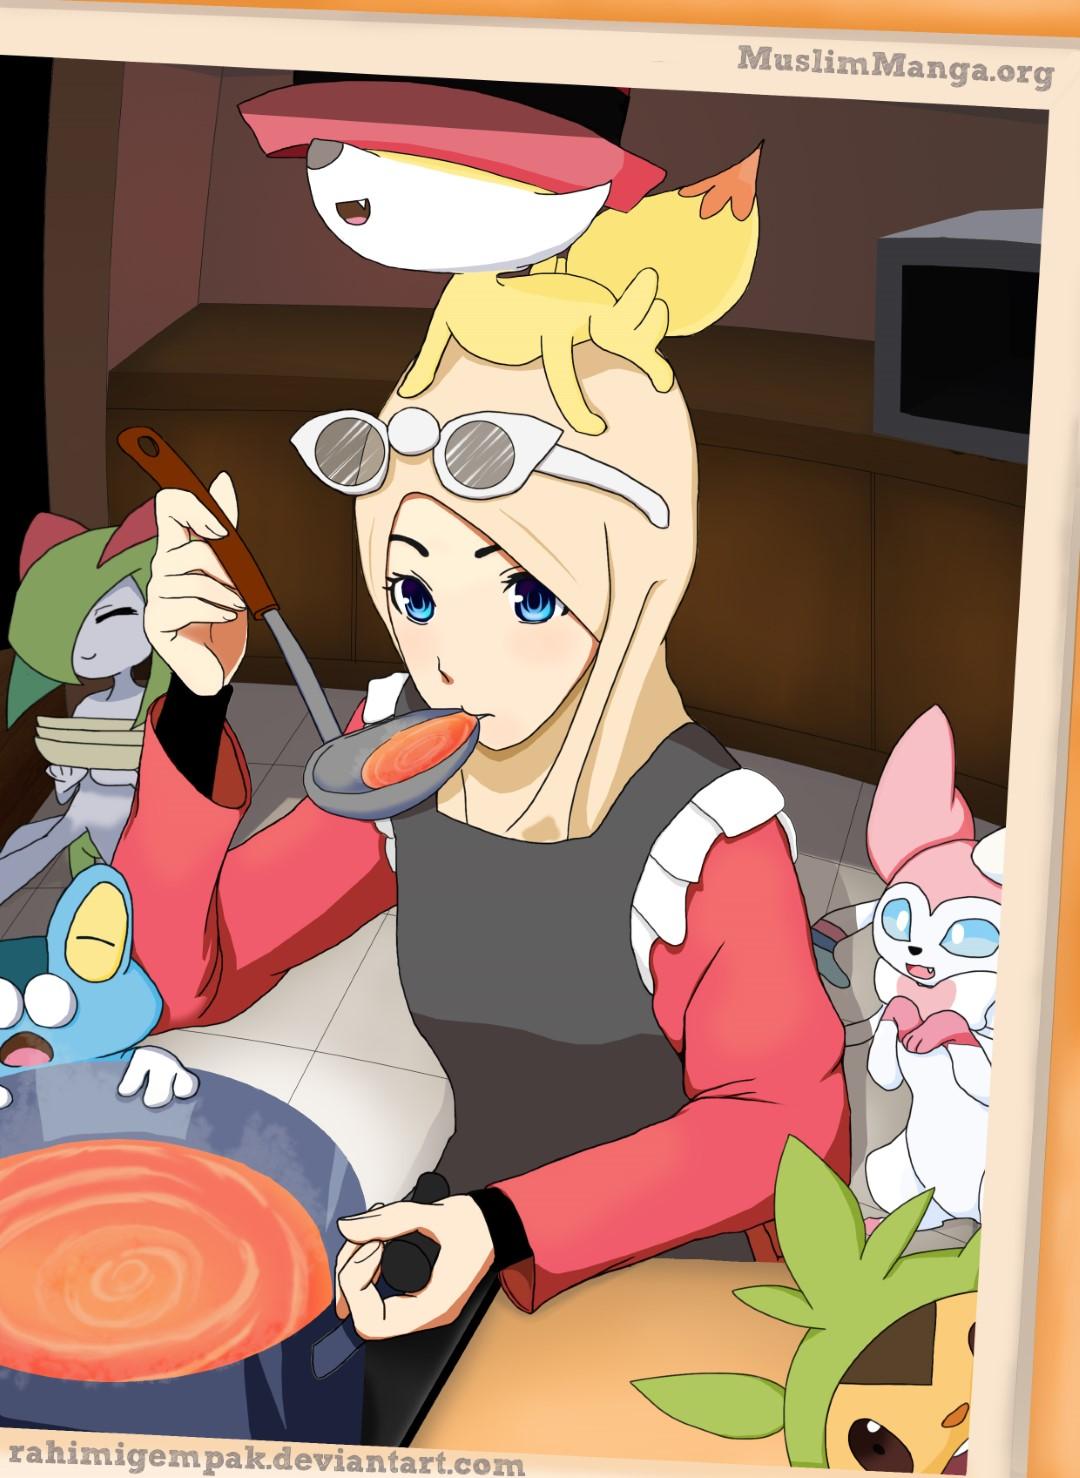 Hijabi Pokemon trainer